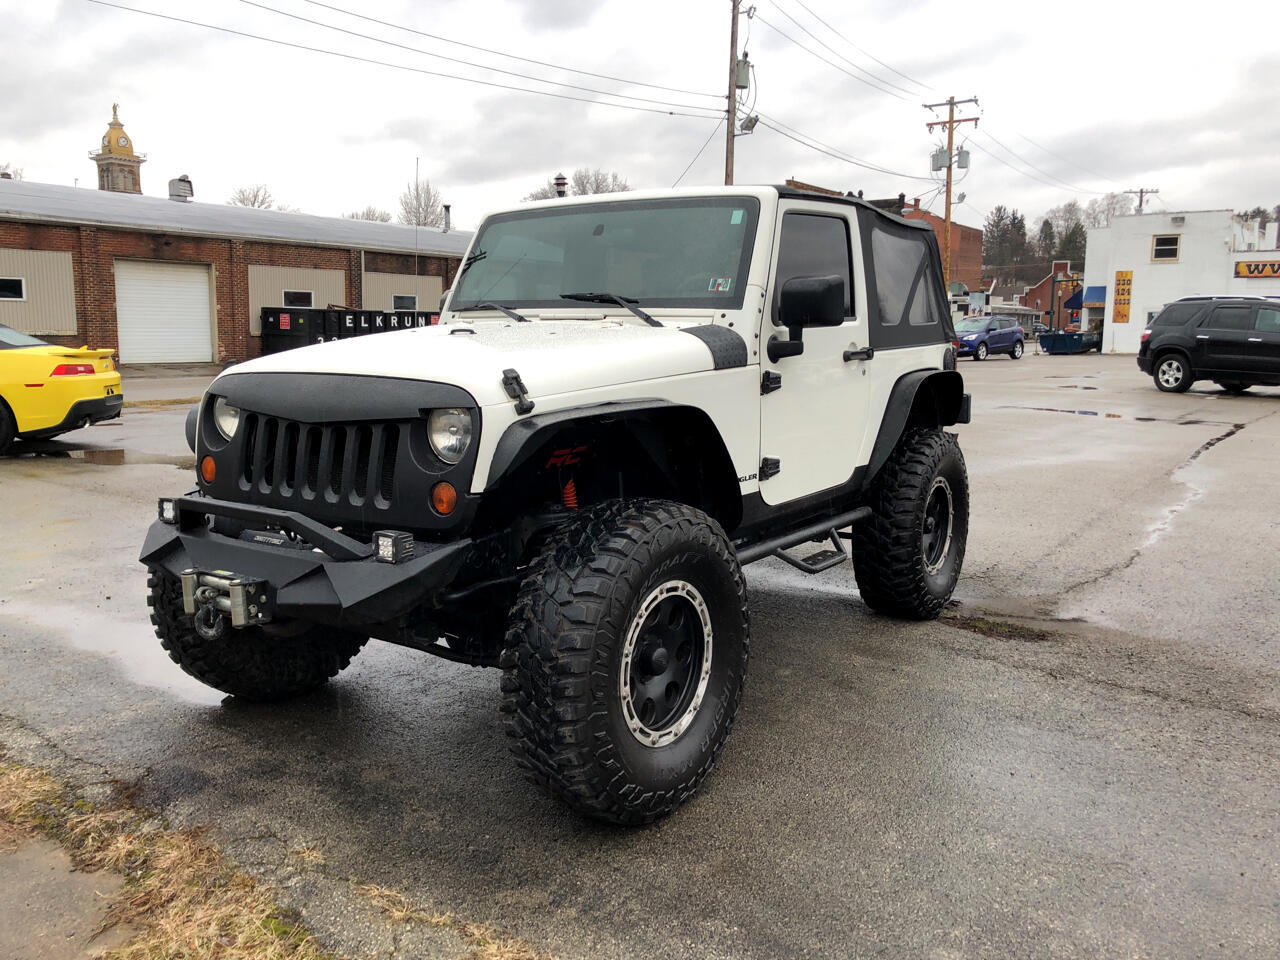 used 2008 jeep wrangler x in lisbon oh auto com 1j4fa24148l582047 auto com